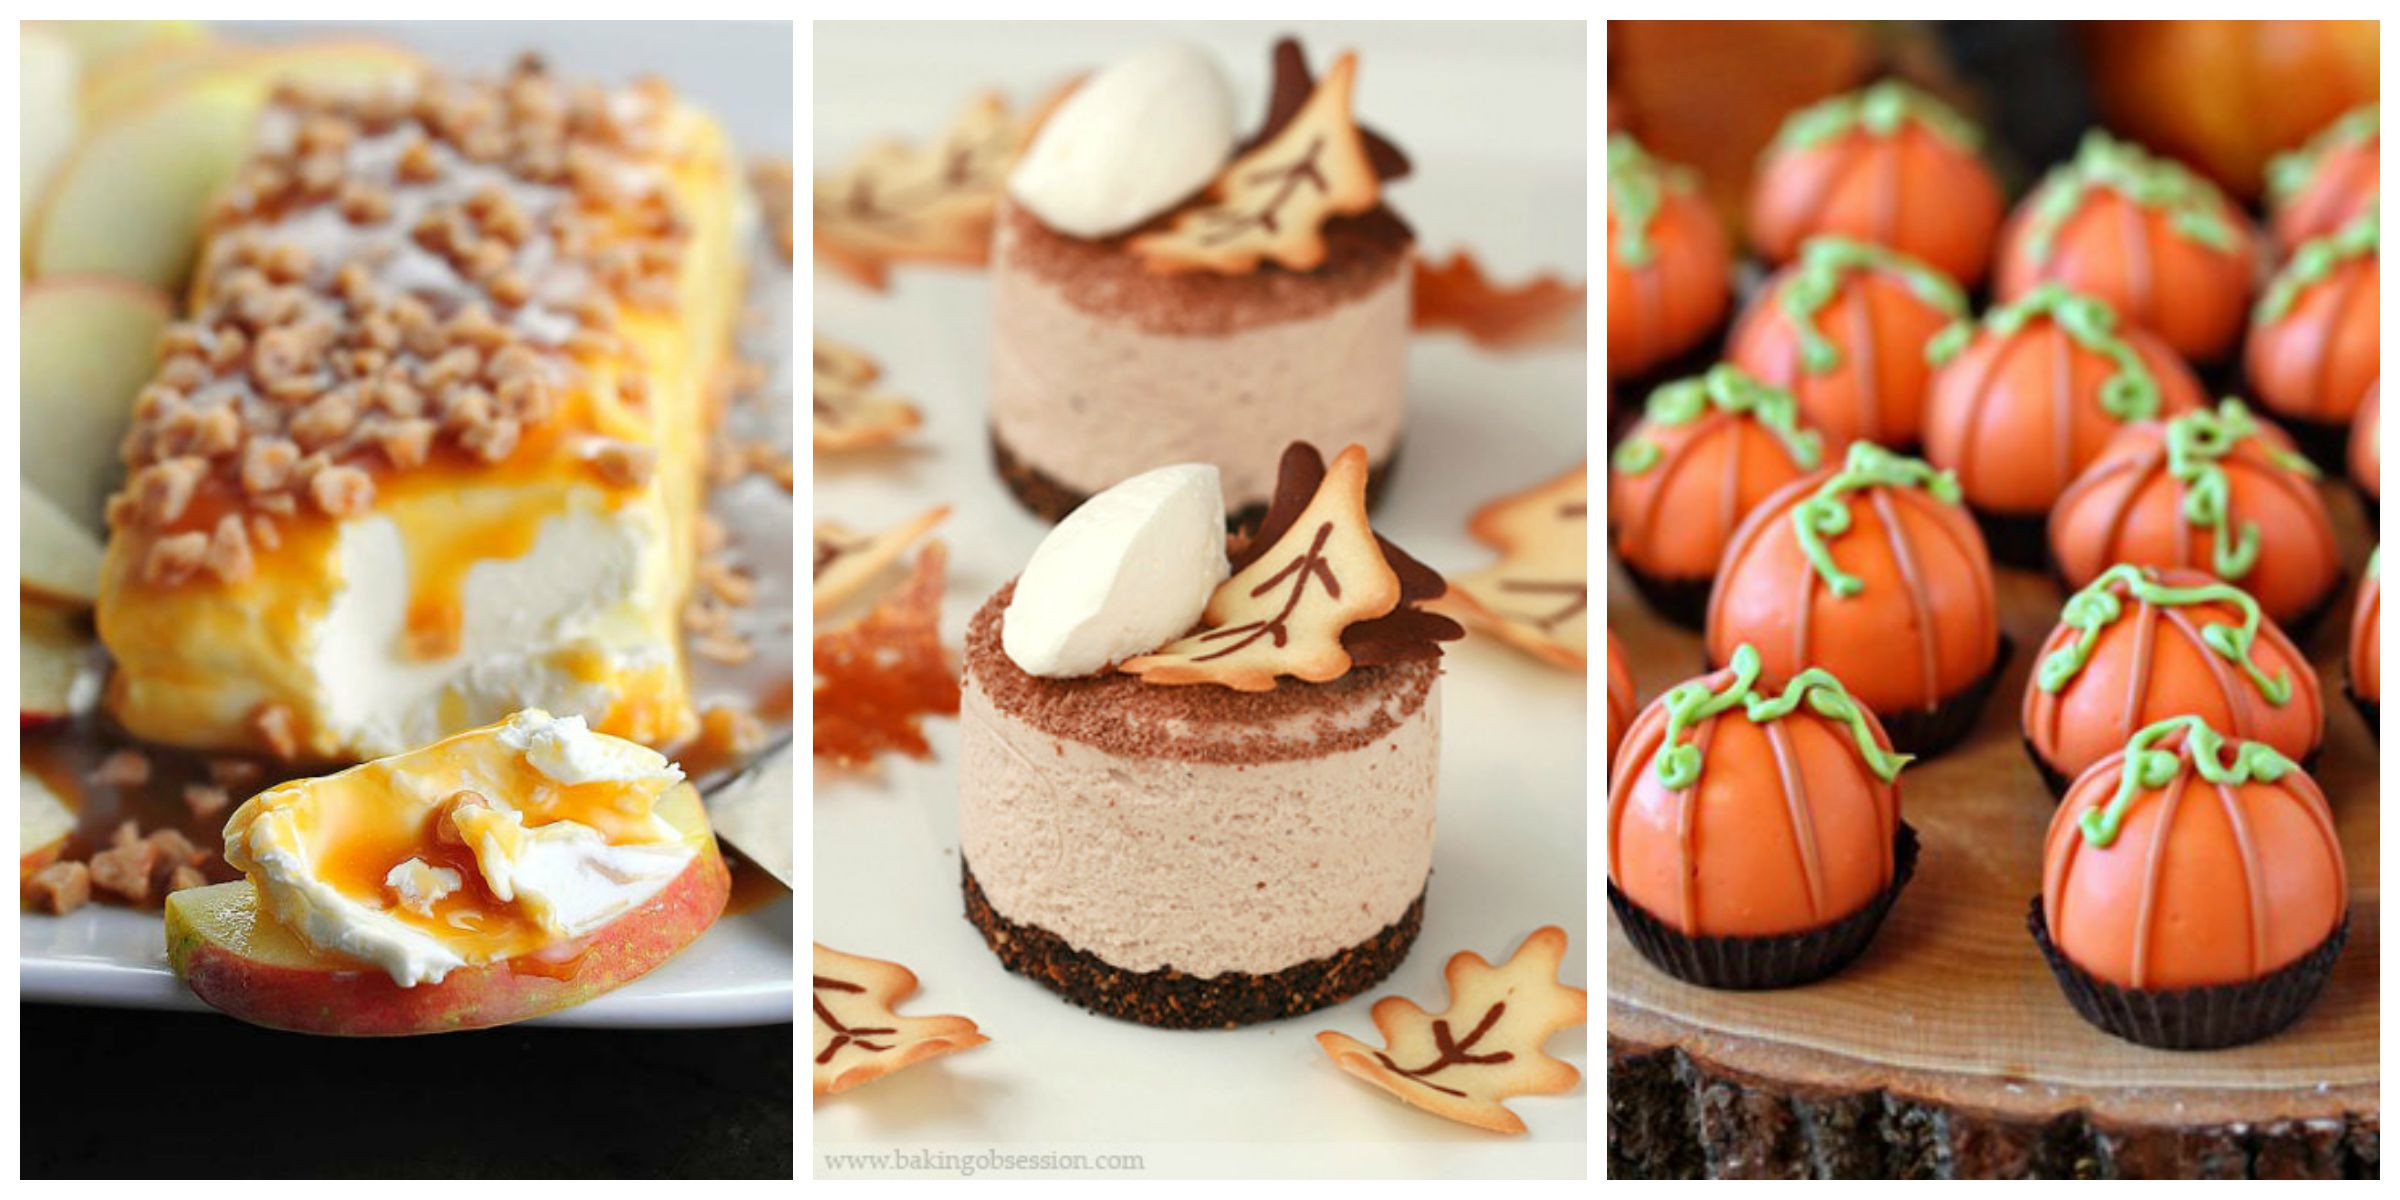 Fall Dessert Recipes  35 Easy Fall Dessert Recipes Best Treats for Autumn Parties